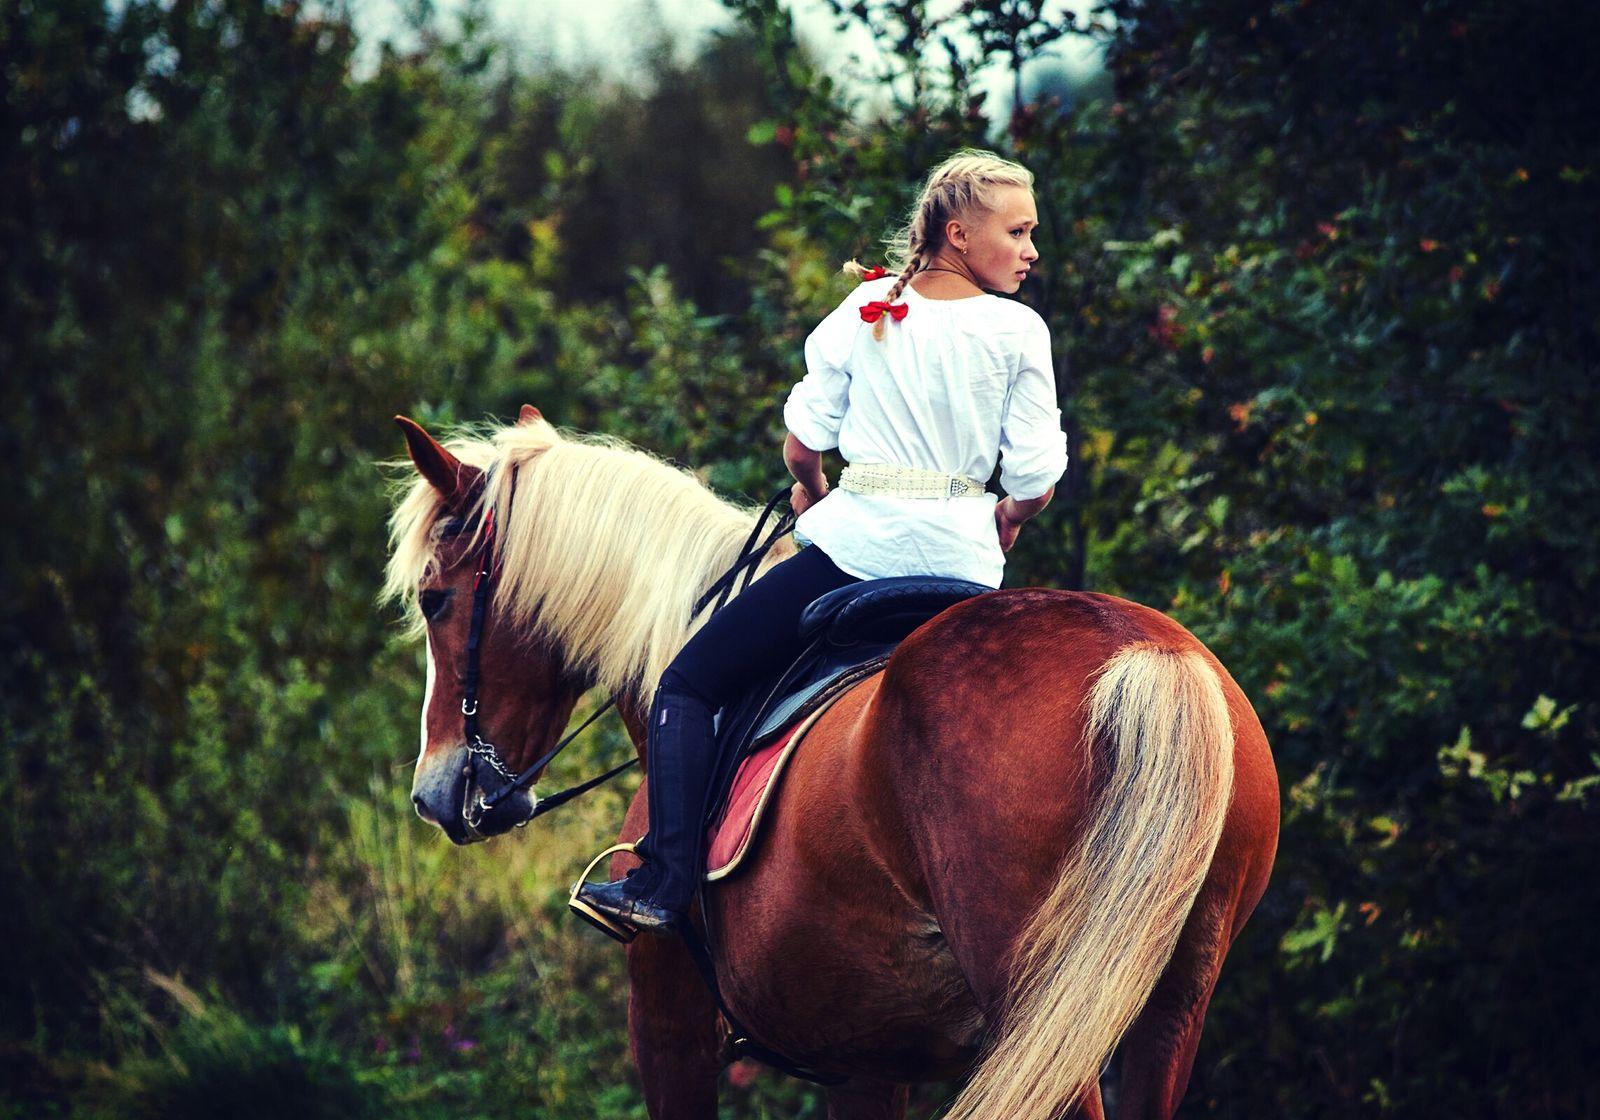 Horse Velikiy Novgorod Витославлицы Sammer2016 Kazachka Horse Life Horse <3 Horse Photography  Horselove Beauty In Nature People Day One Person Nature